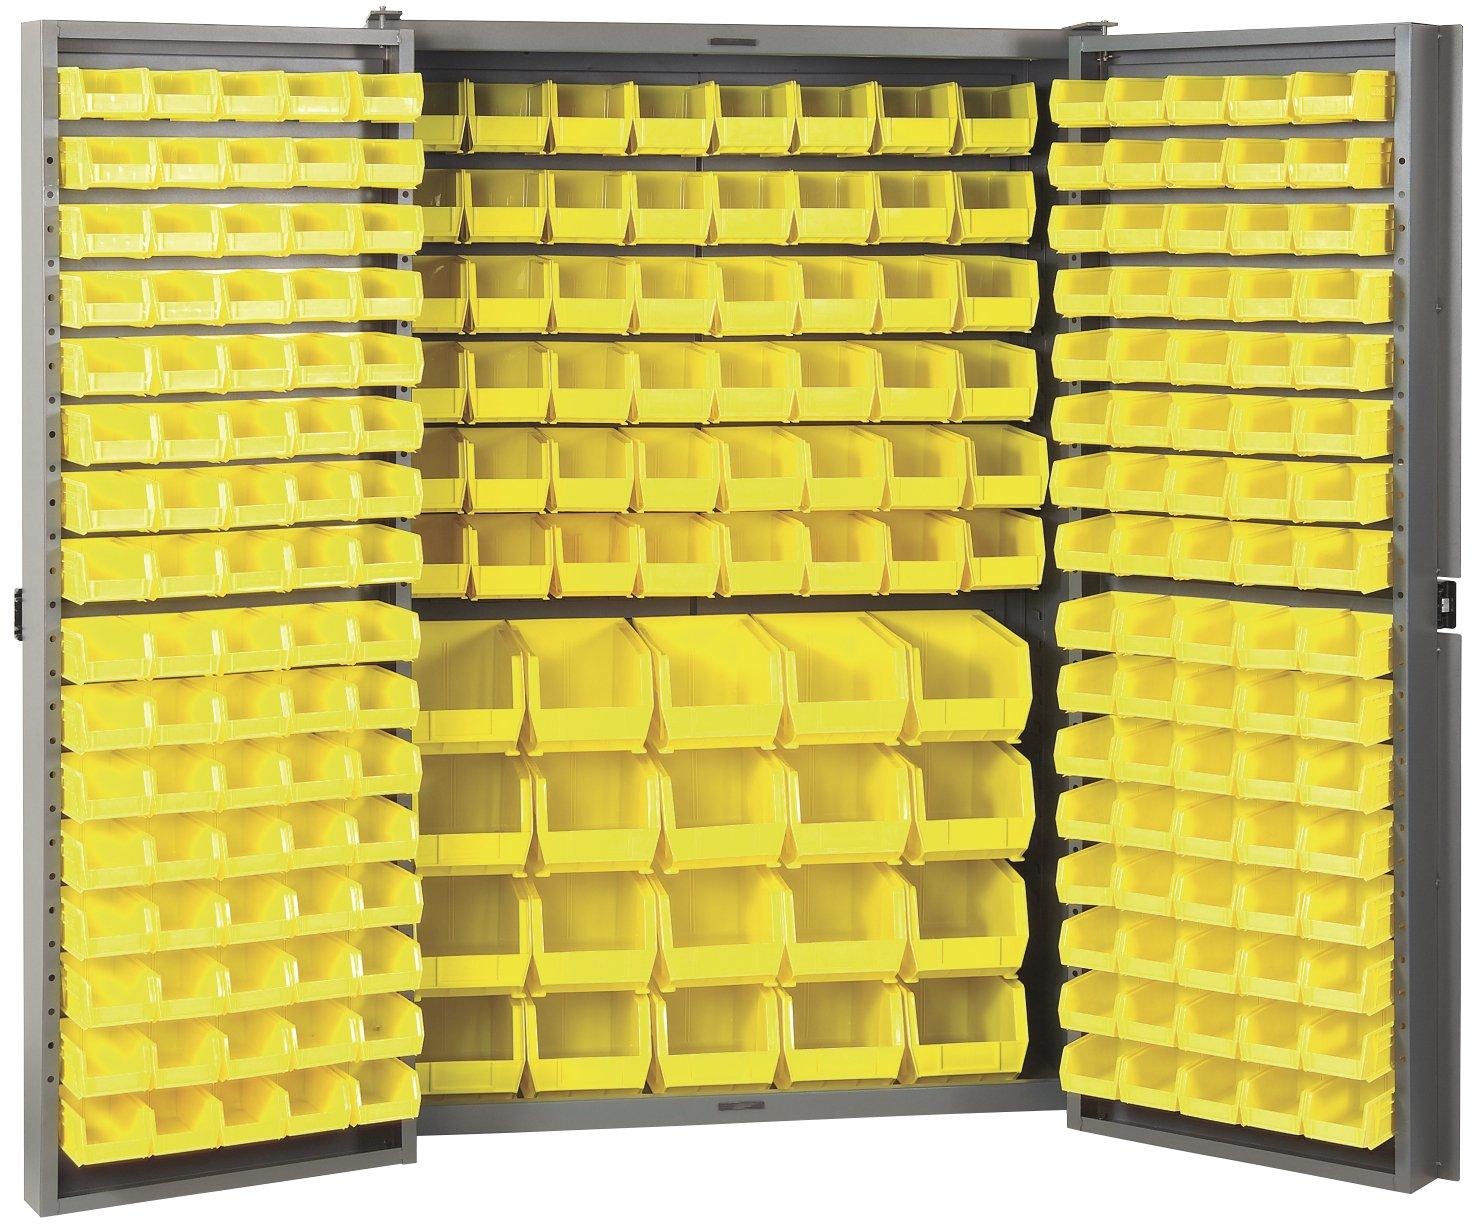 Amazon.com: Akro-Mils HD4824 F Heavy Duty Steel Louvered Storage ...